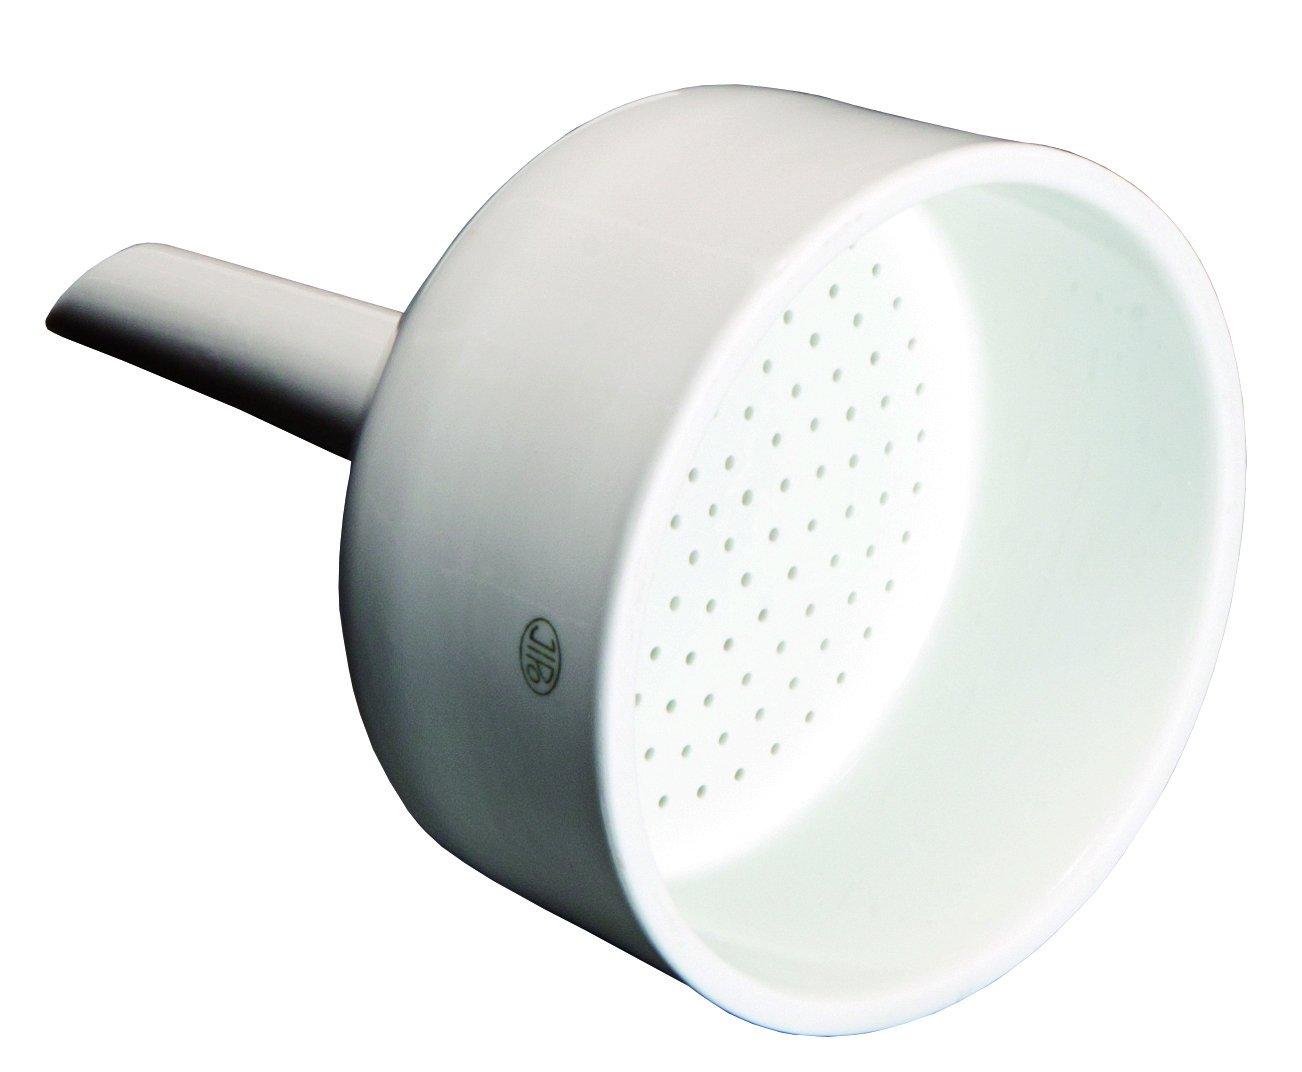 Vee Gee Scientific 53223-7501 Porcelain Buchner Funnel, 116 mm Diameter